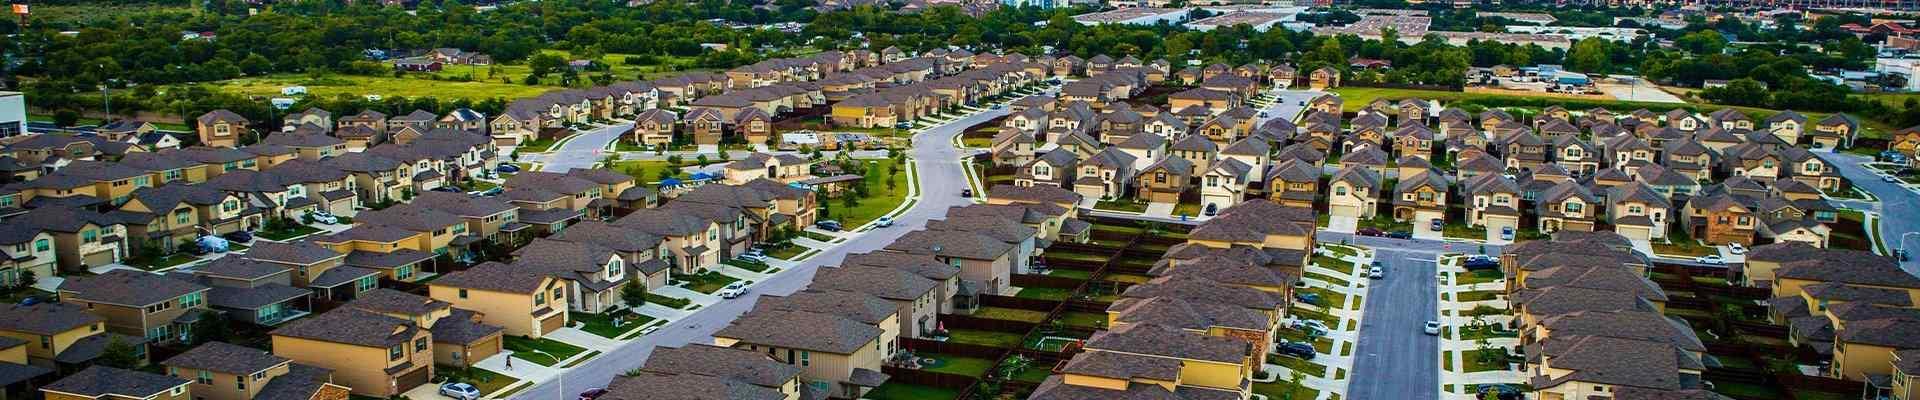 aerial view of a suburban neighborhood in corinth texas